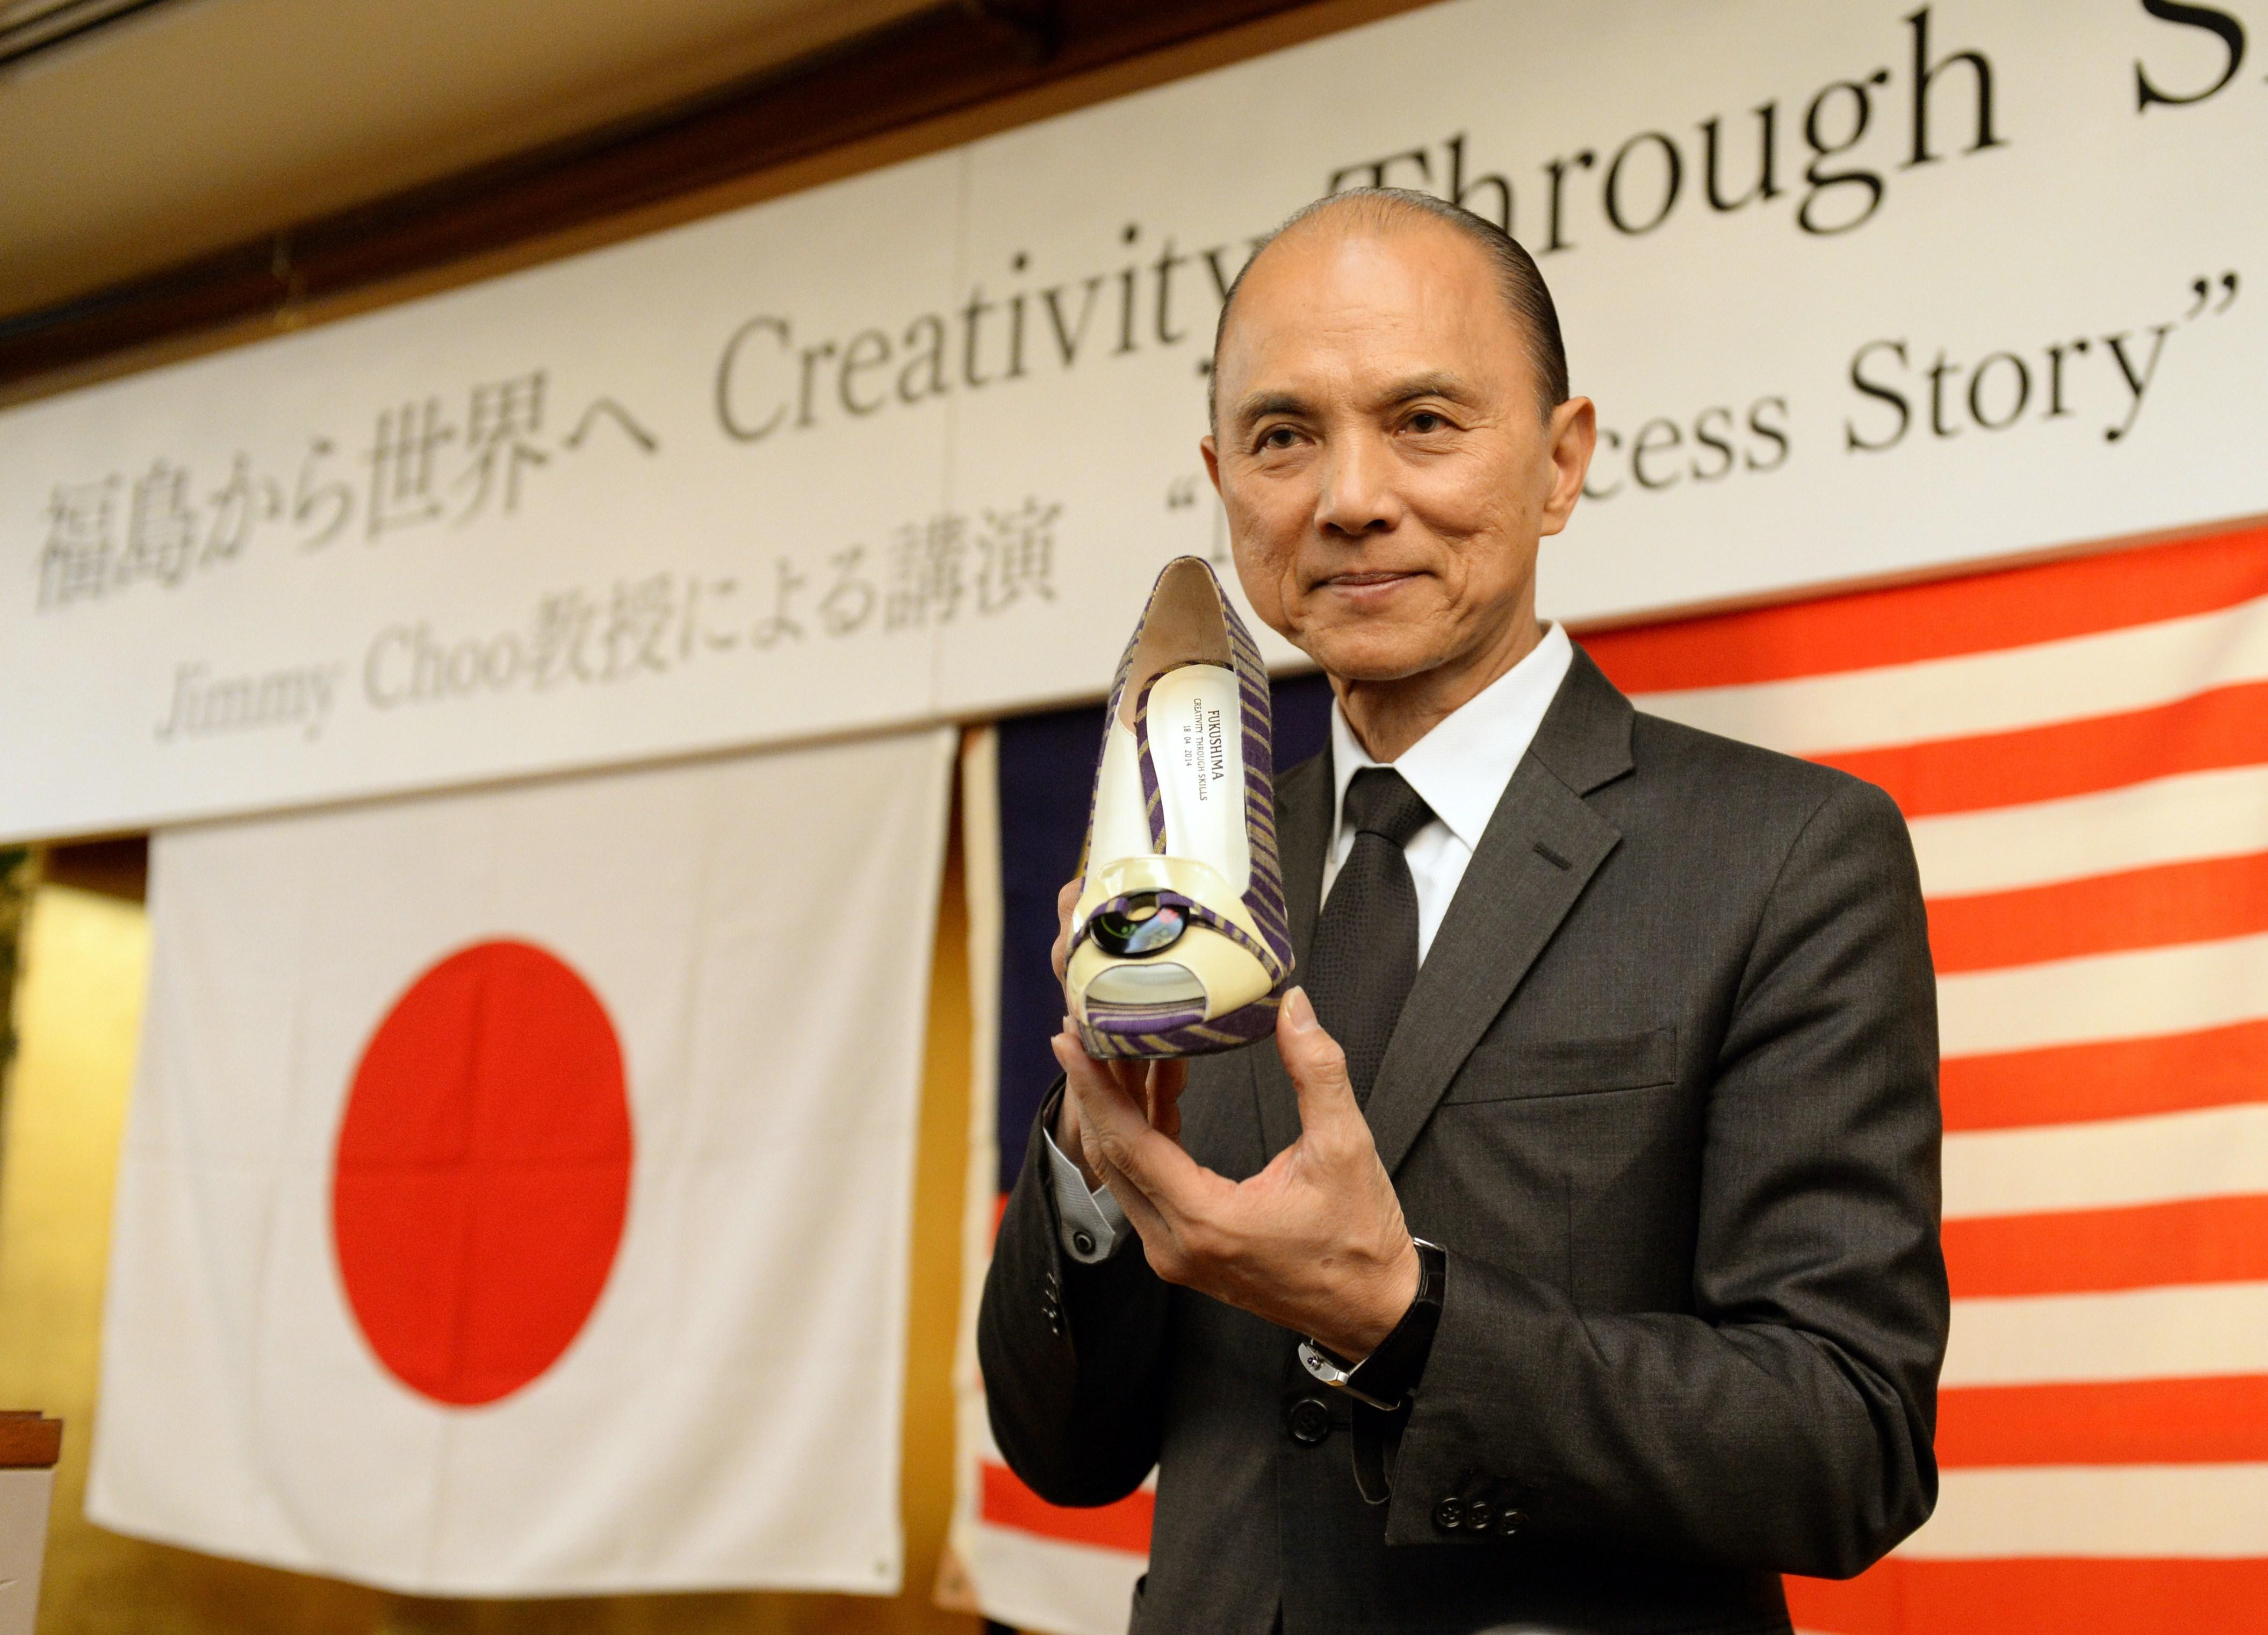 NTK Prof. Jimmy Choo, OBE tại sự kiện tặng già ở fukushima